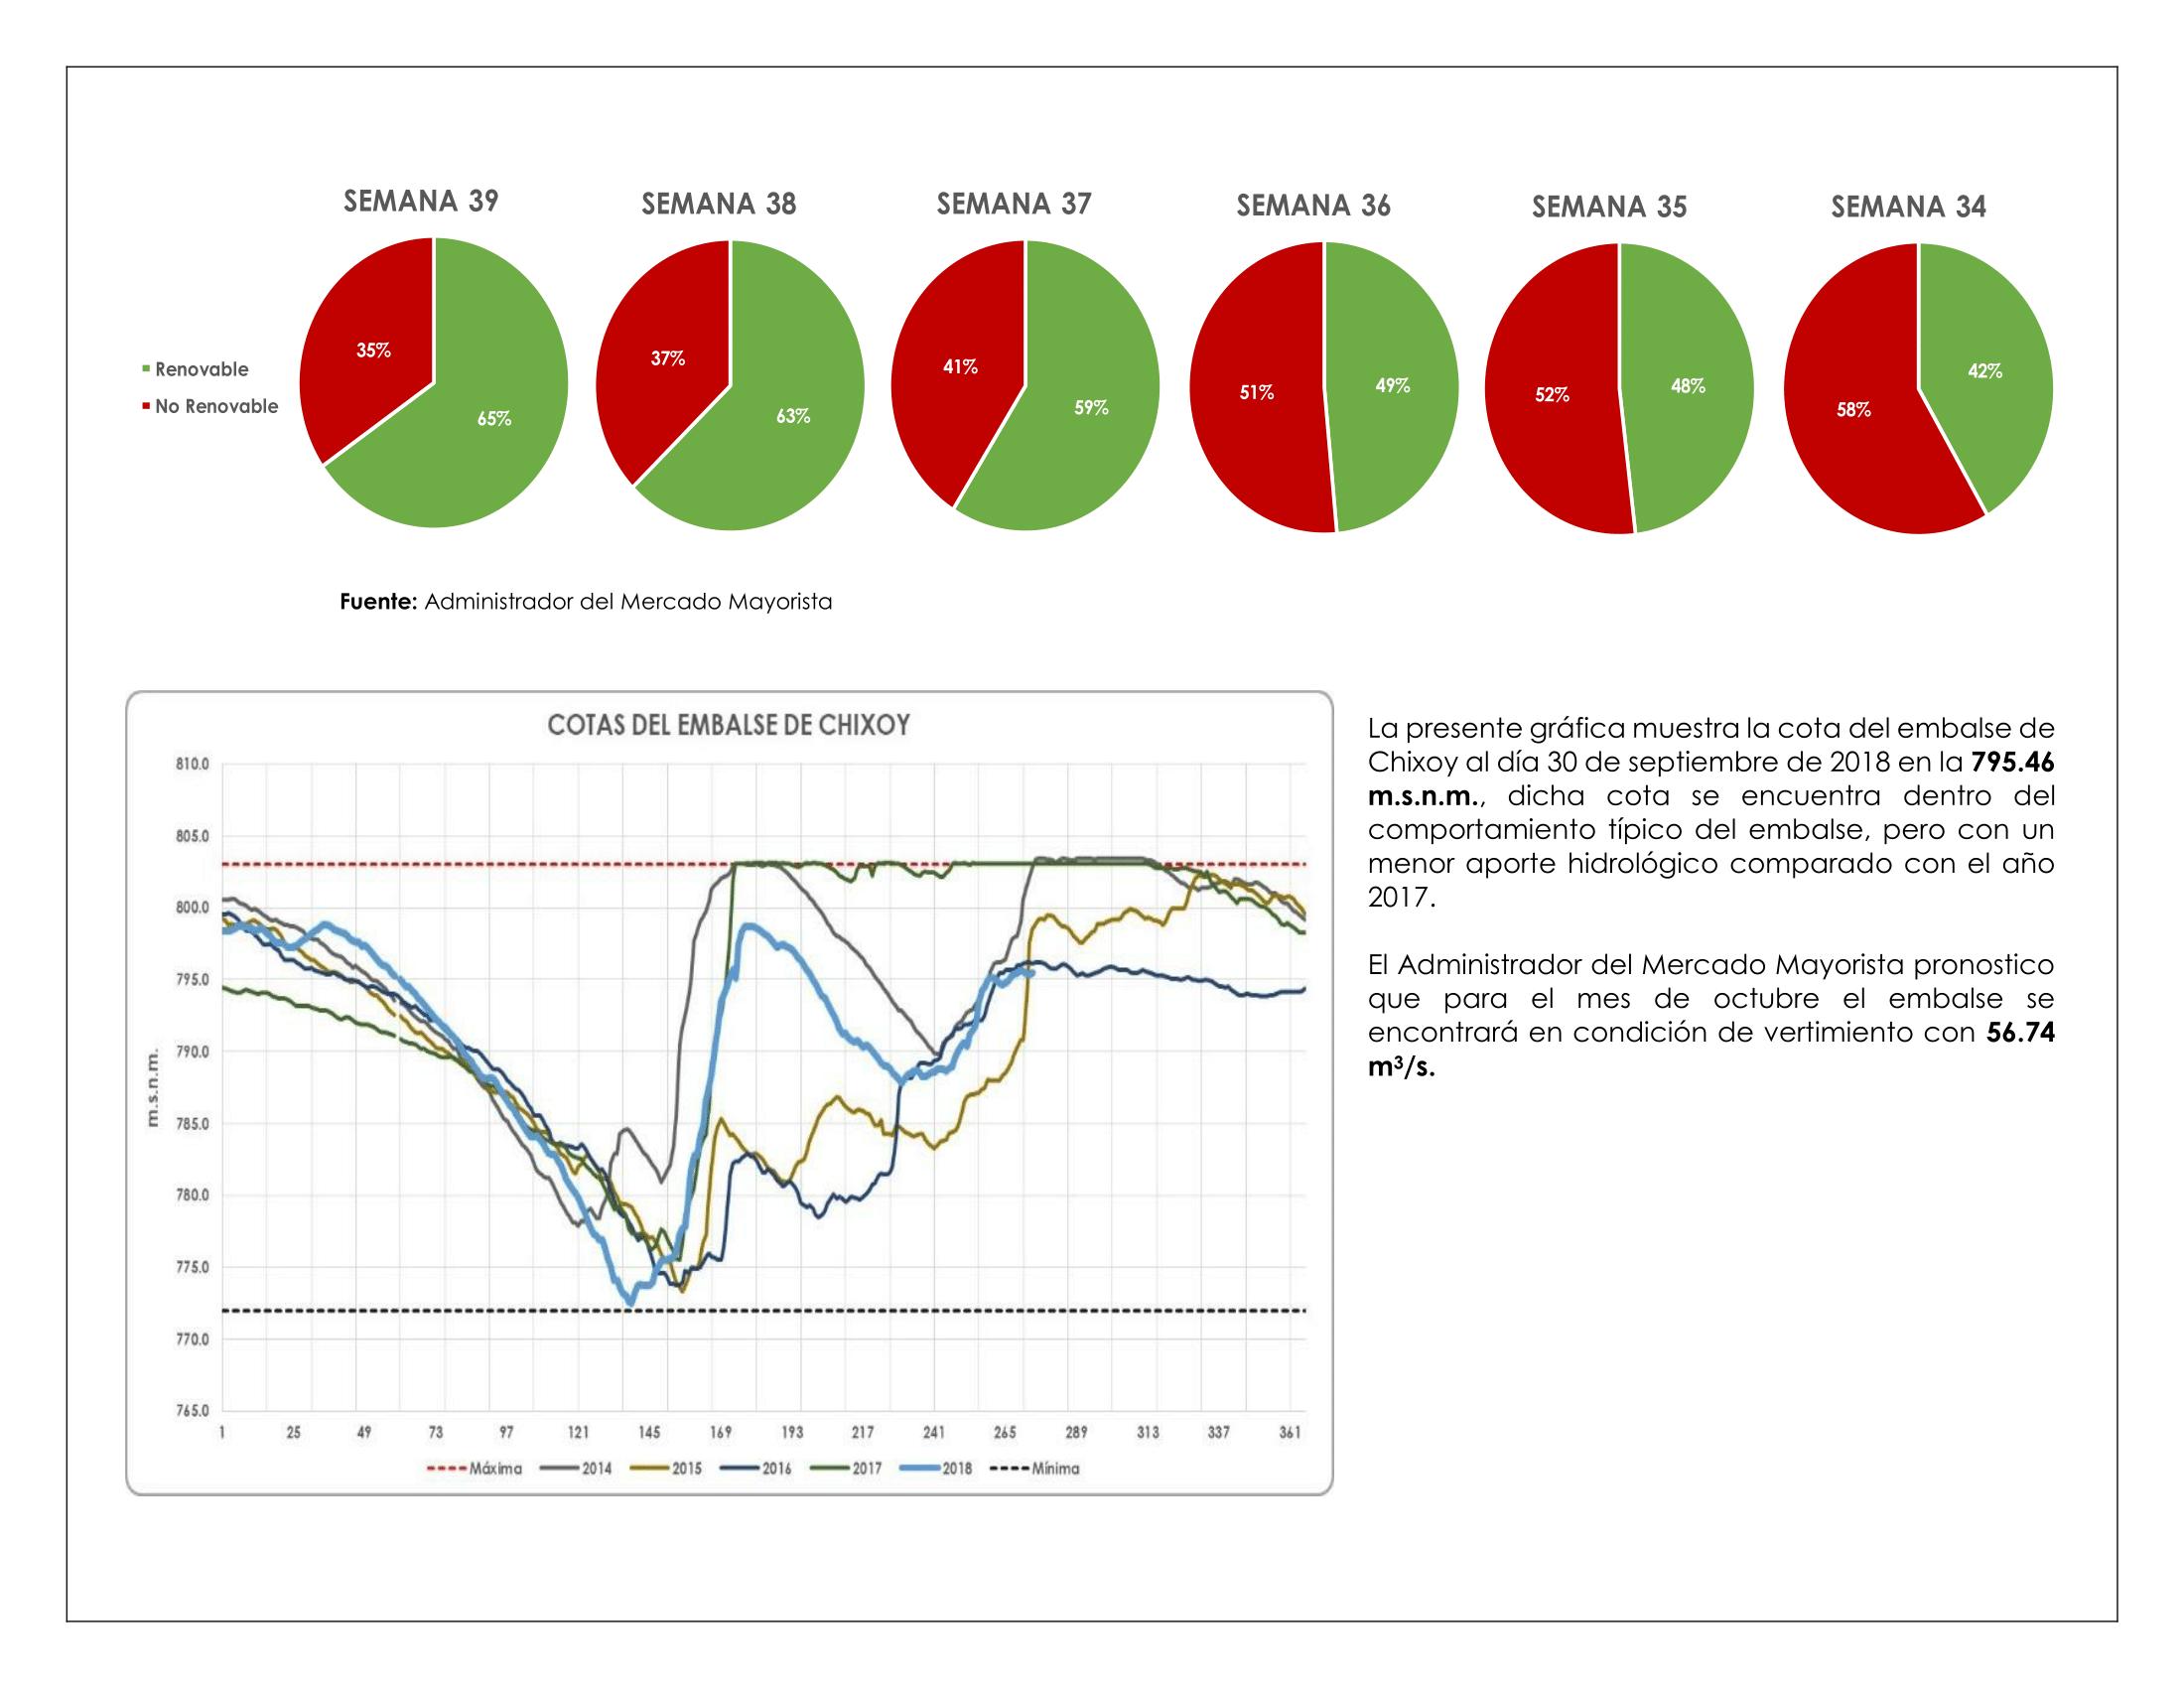 [Semana 39]-3